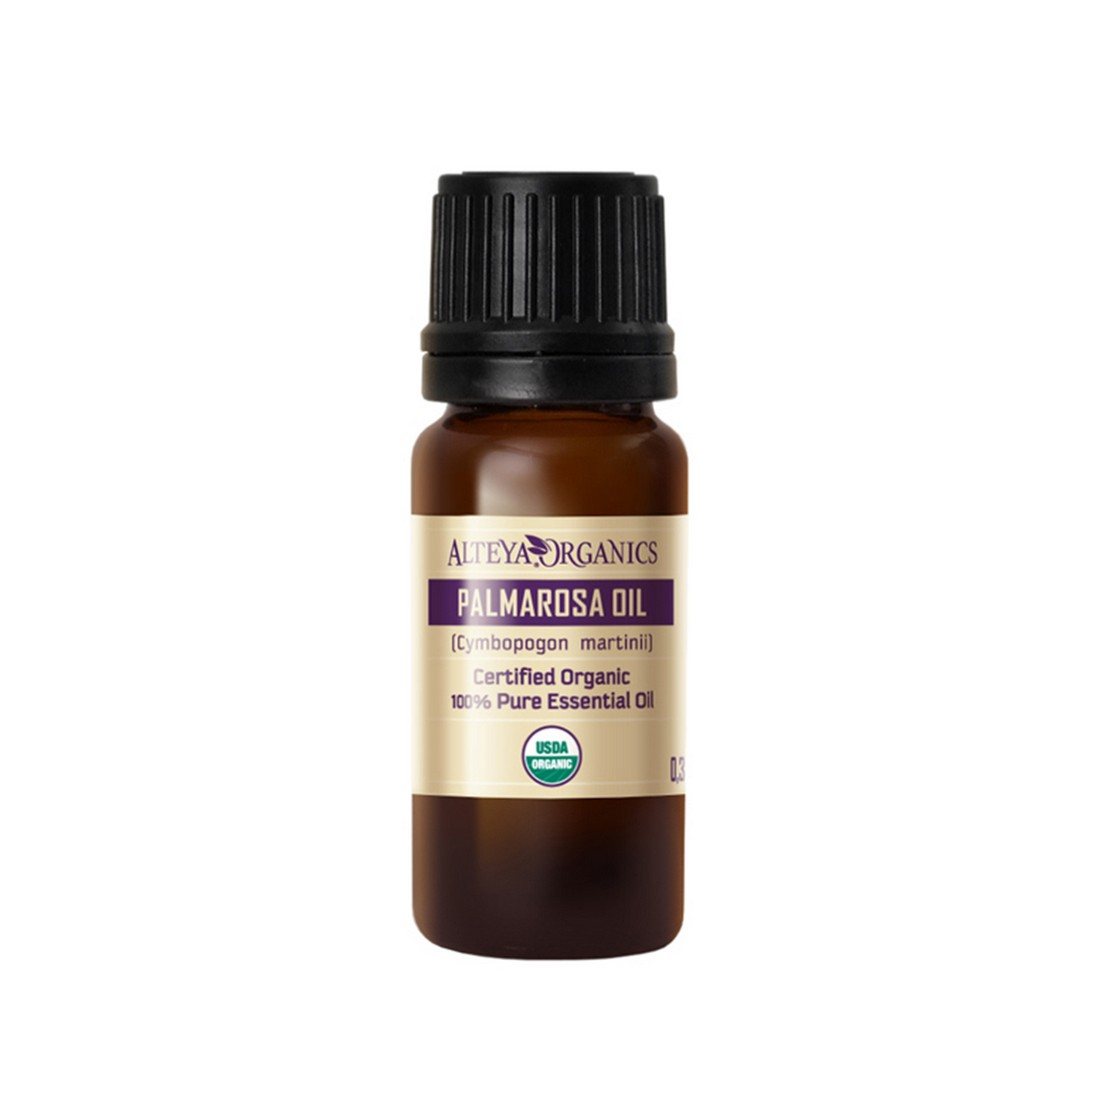 Bio organic essential palmarosa oil Alteya Organics 10 ml.